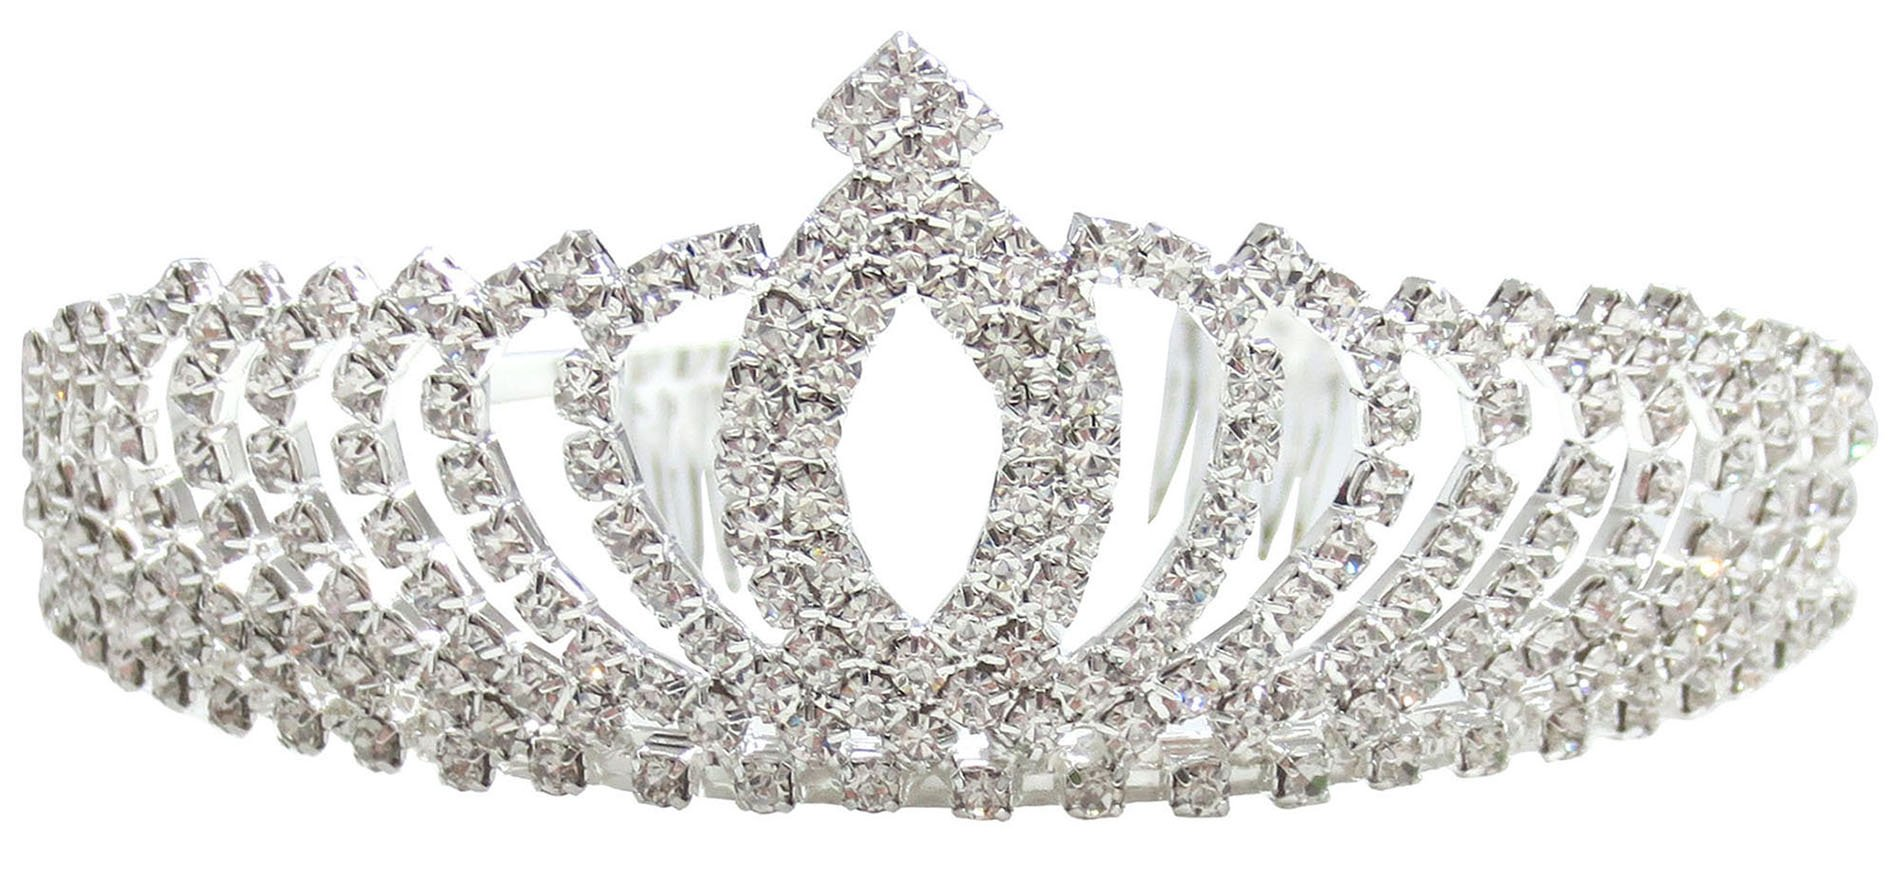 Rhinestone Tiara Crown Wedding Bridal Pageant Princess Headband, Style 5